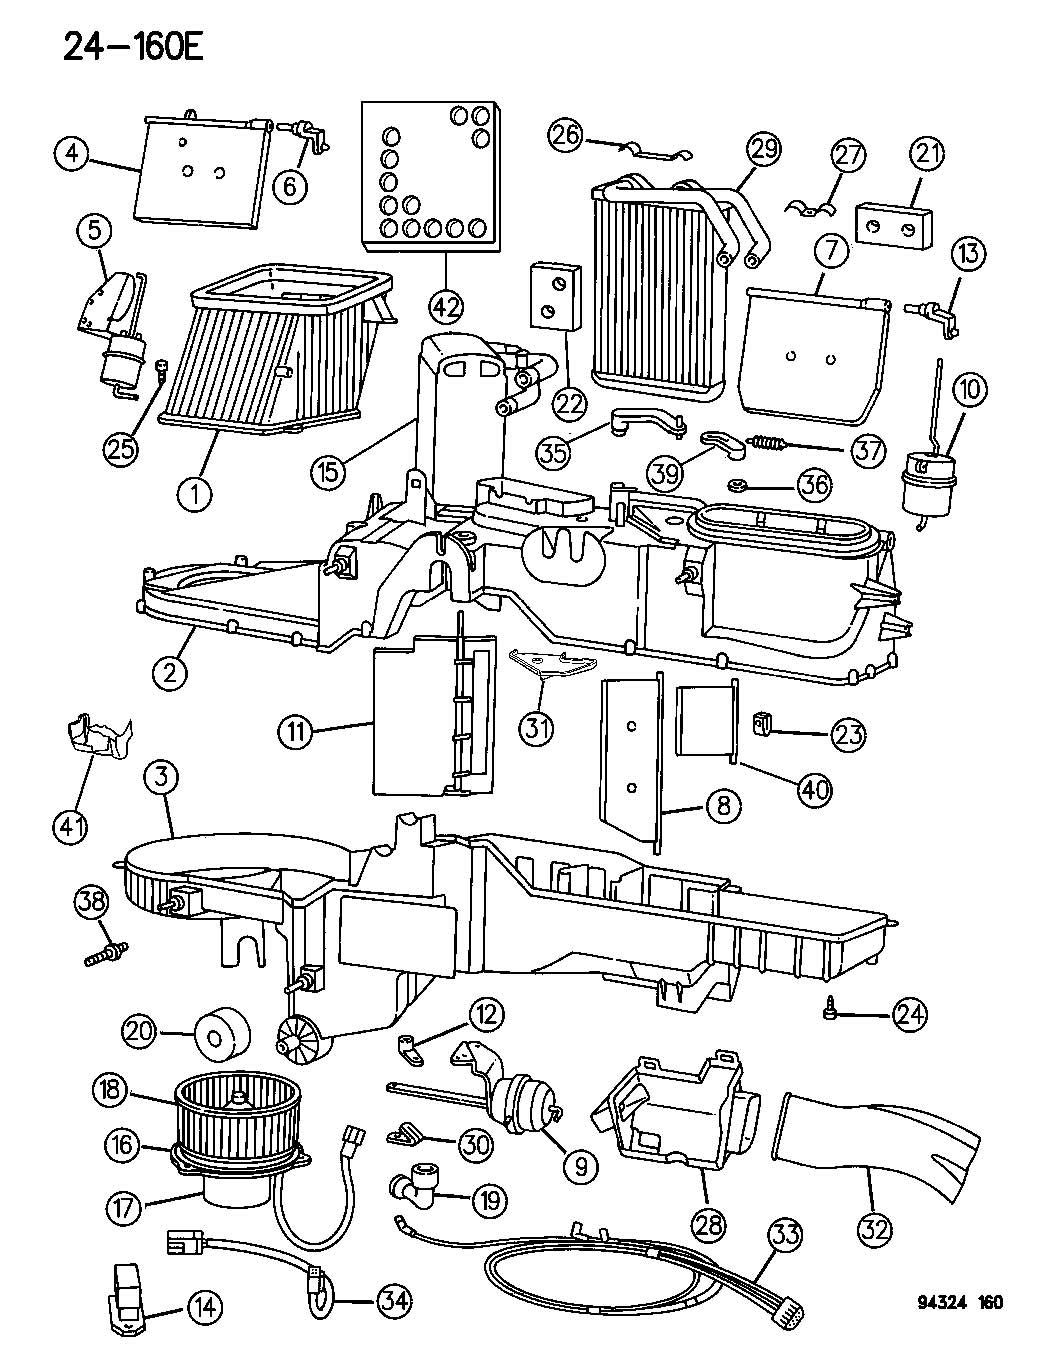 30 Stihl Ht 101 Parts Diagram